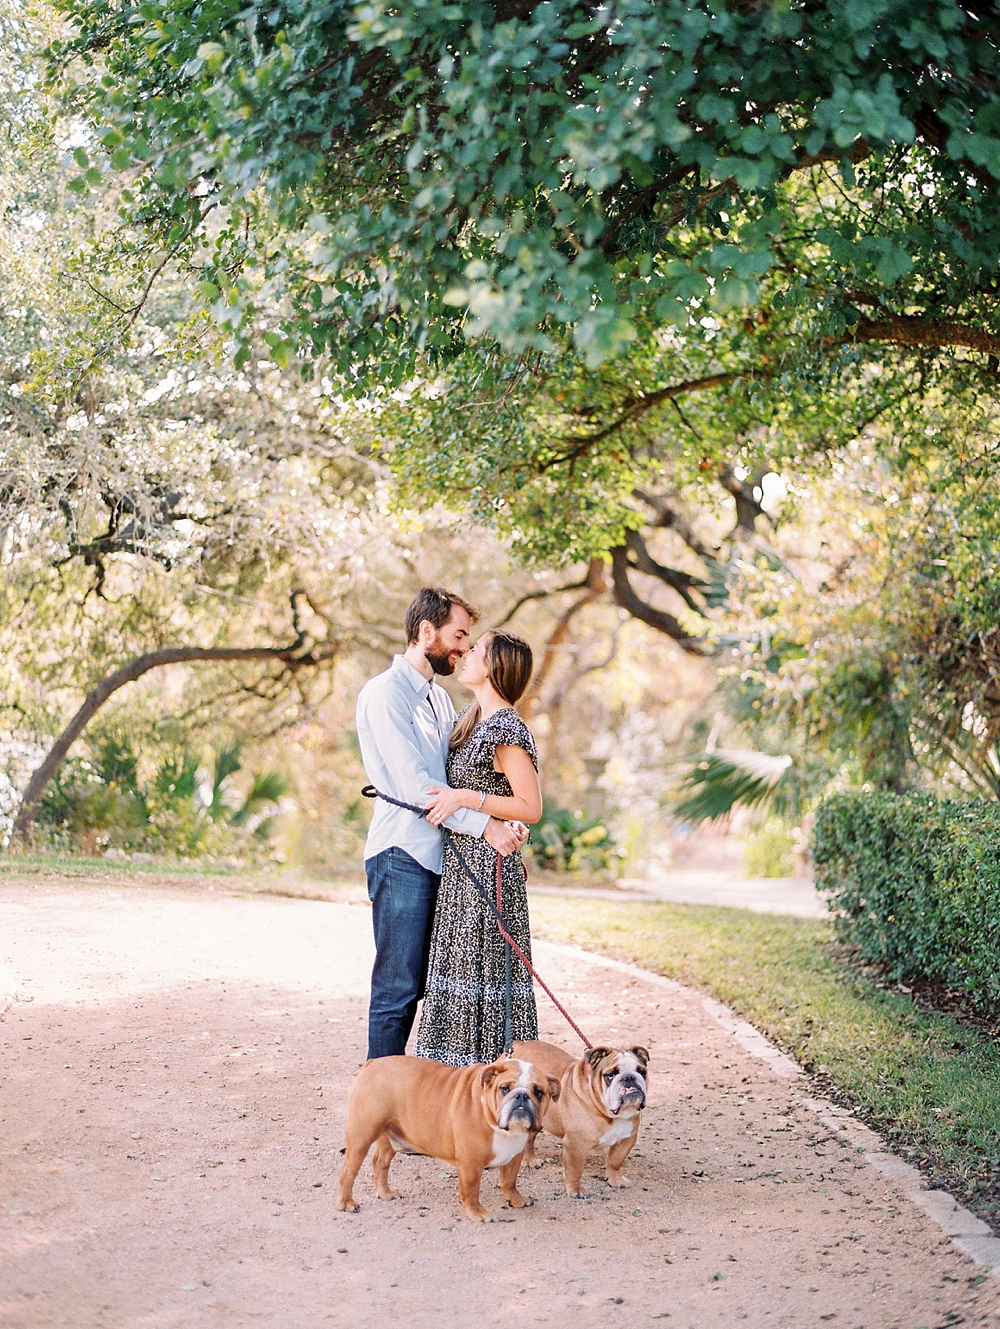 kristin-la-voie-photography-Austin-Wedding-Photographer-laguna-gloria-commodore-perry-estate-engagement-76